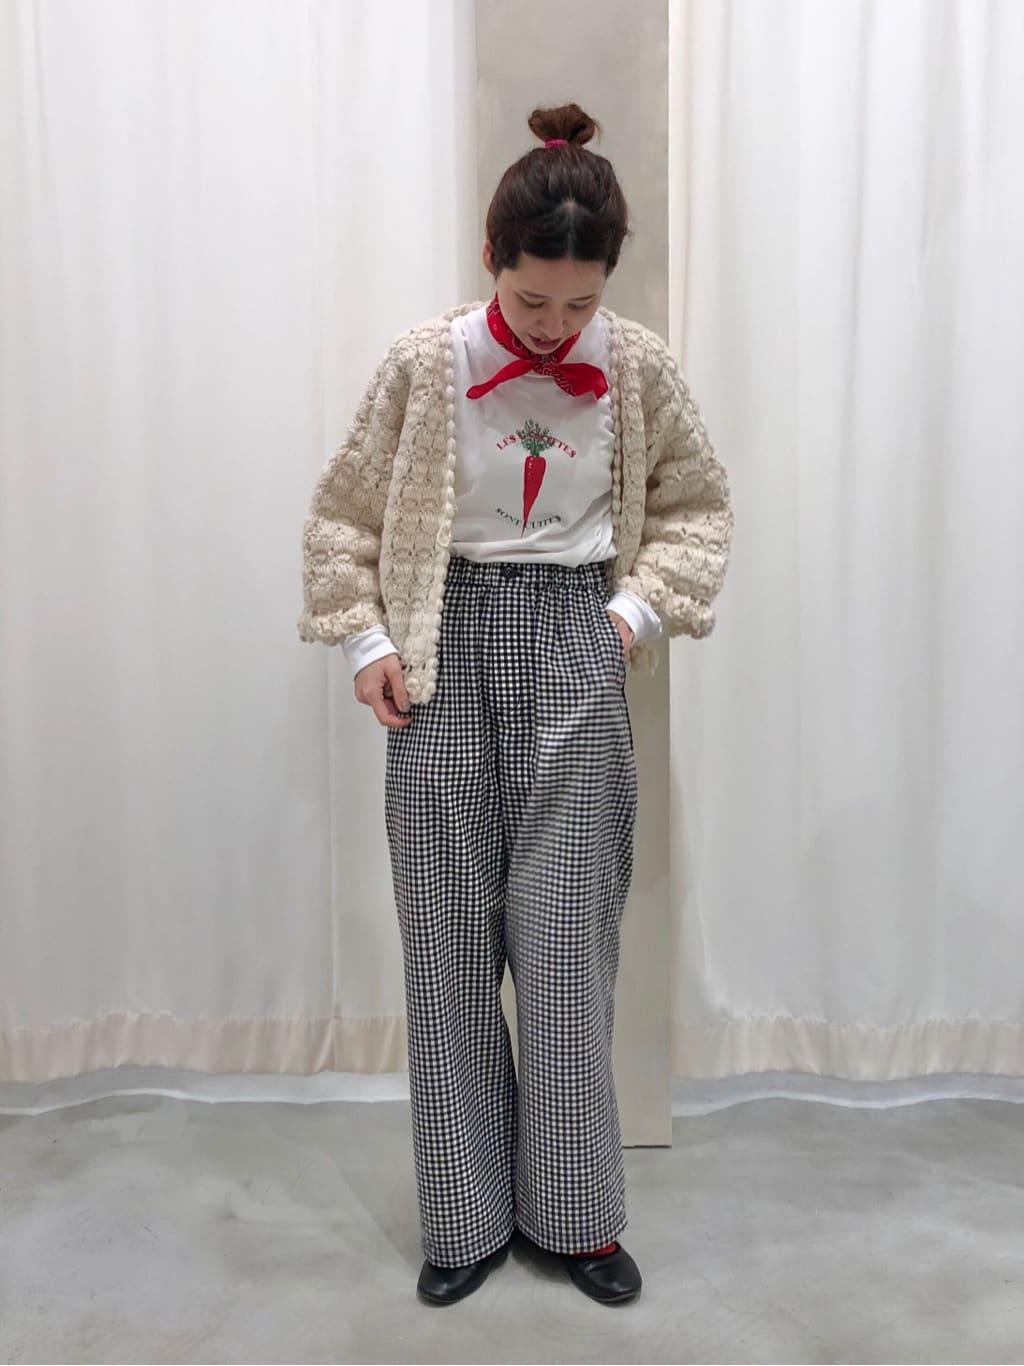 CHILD WOMAN , PAR ICI 東京スカイツリータウン・ソラマチ 2021.09.21